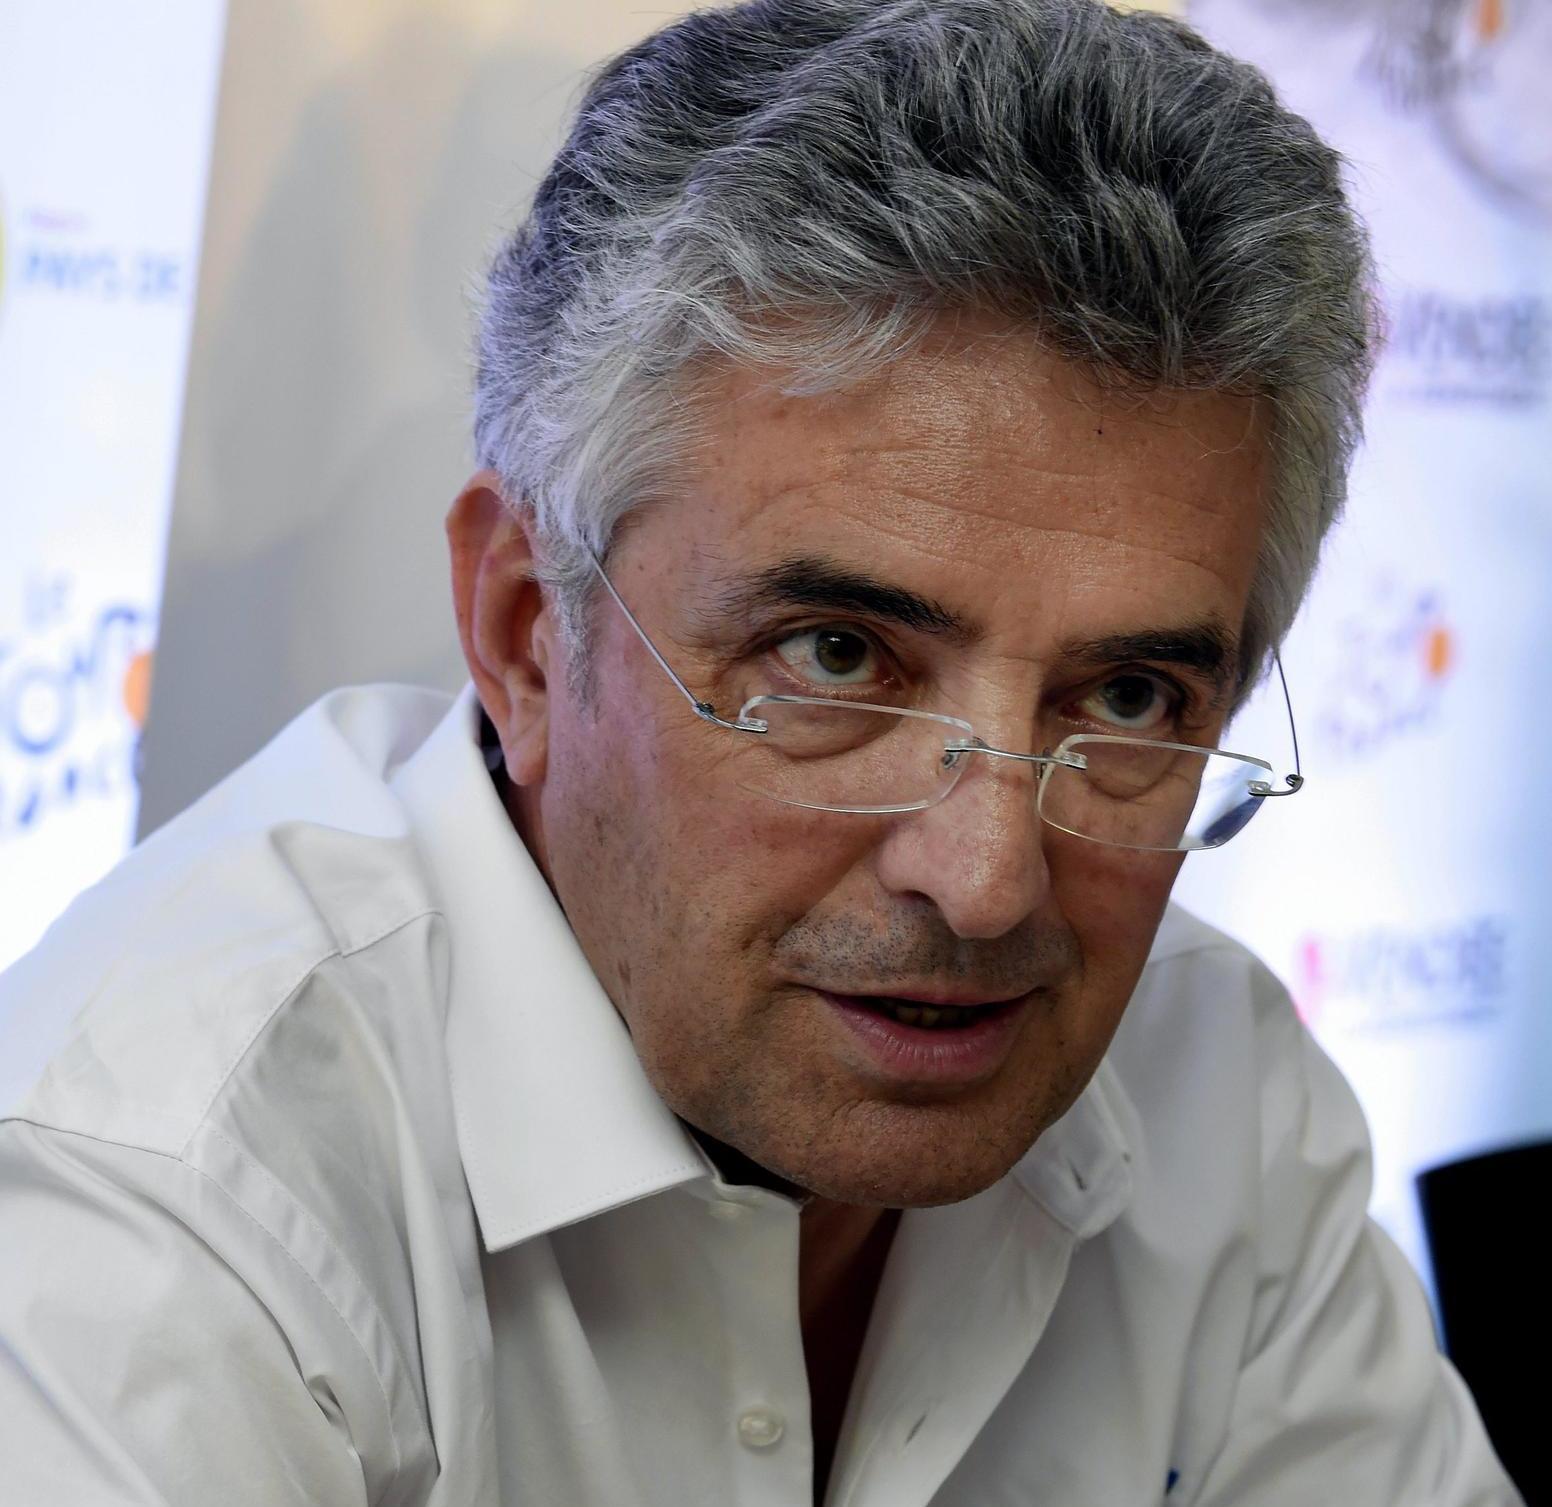 Christophe Bérard